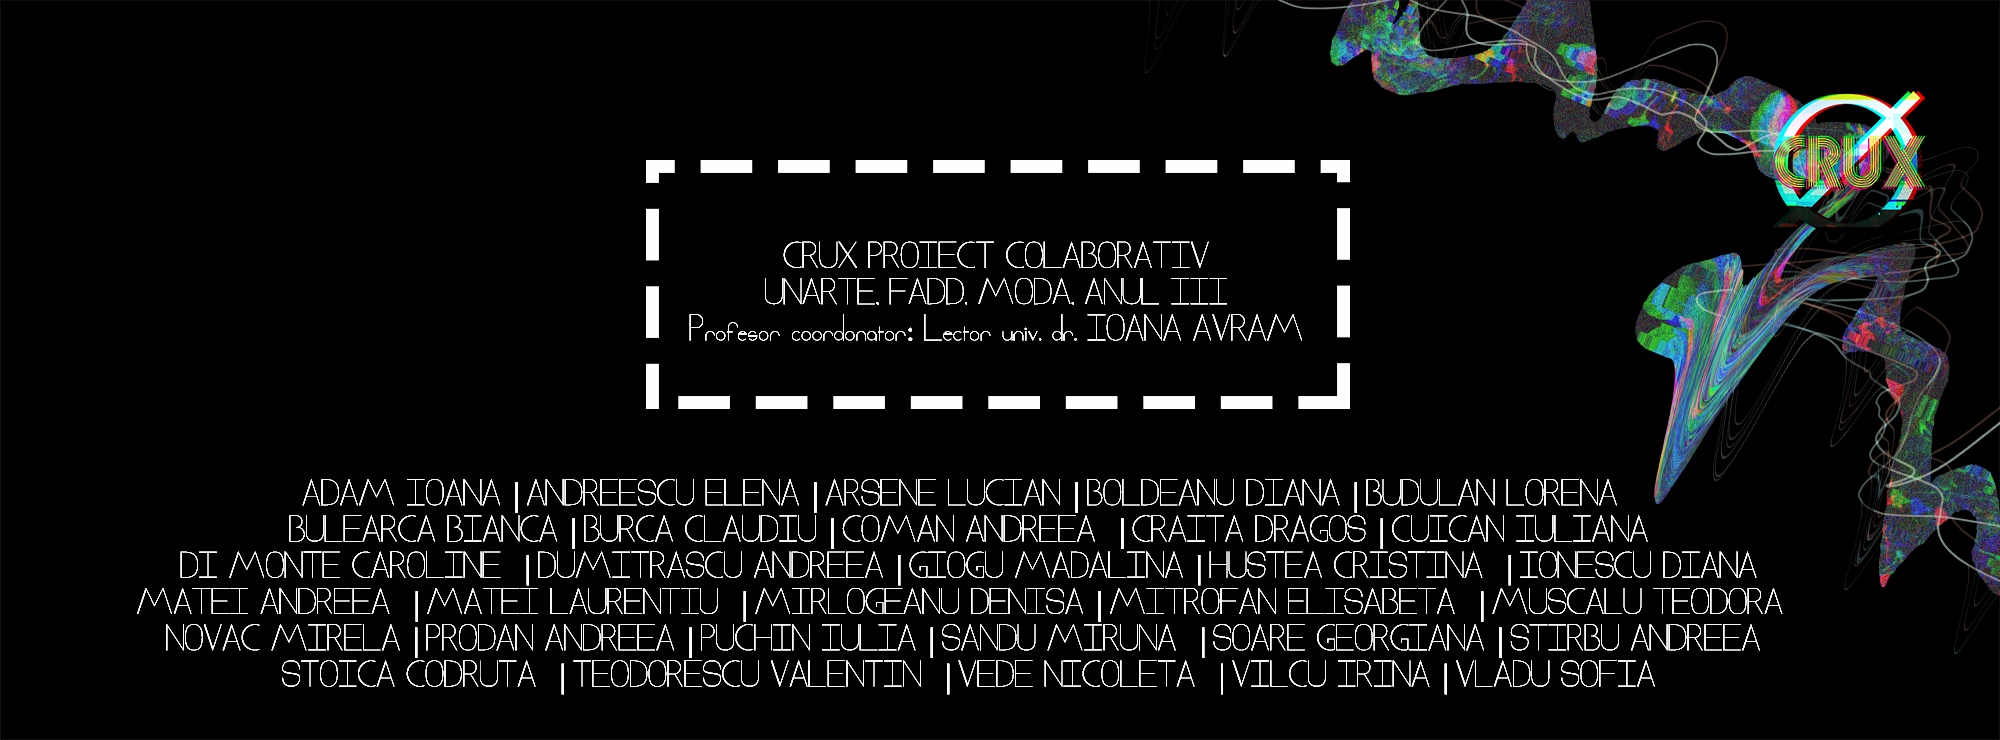 CruxUNarte (@cruxunarte) Cover Image